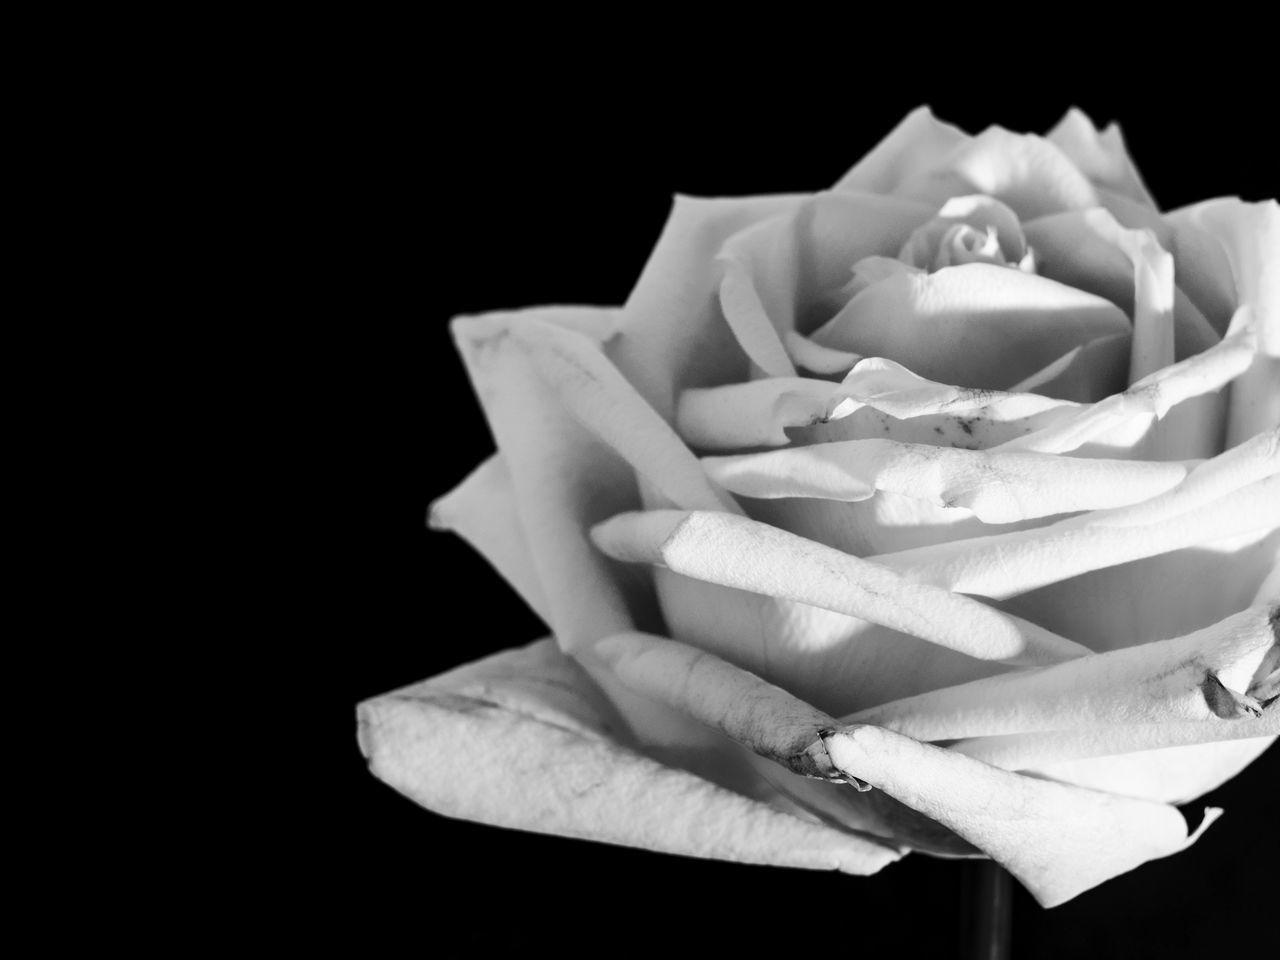 idmphotographer.com Beauty In Nature Black Background Blackandwhite Close-up Fine Art Flower Flower Head Fragility Freshness Indoor Nature No People Rose - Flower Studio Photography Studio Shot